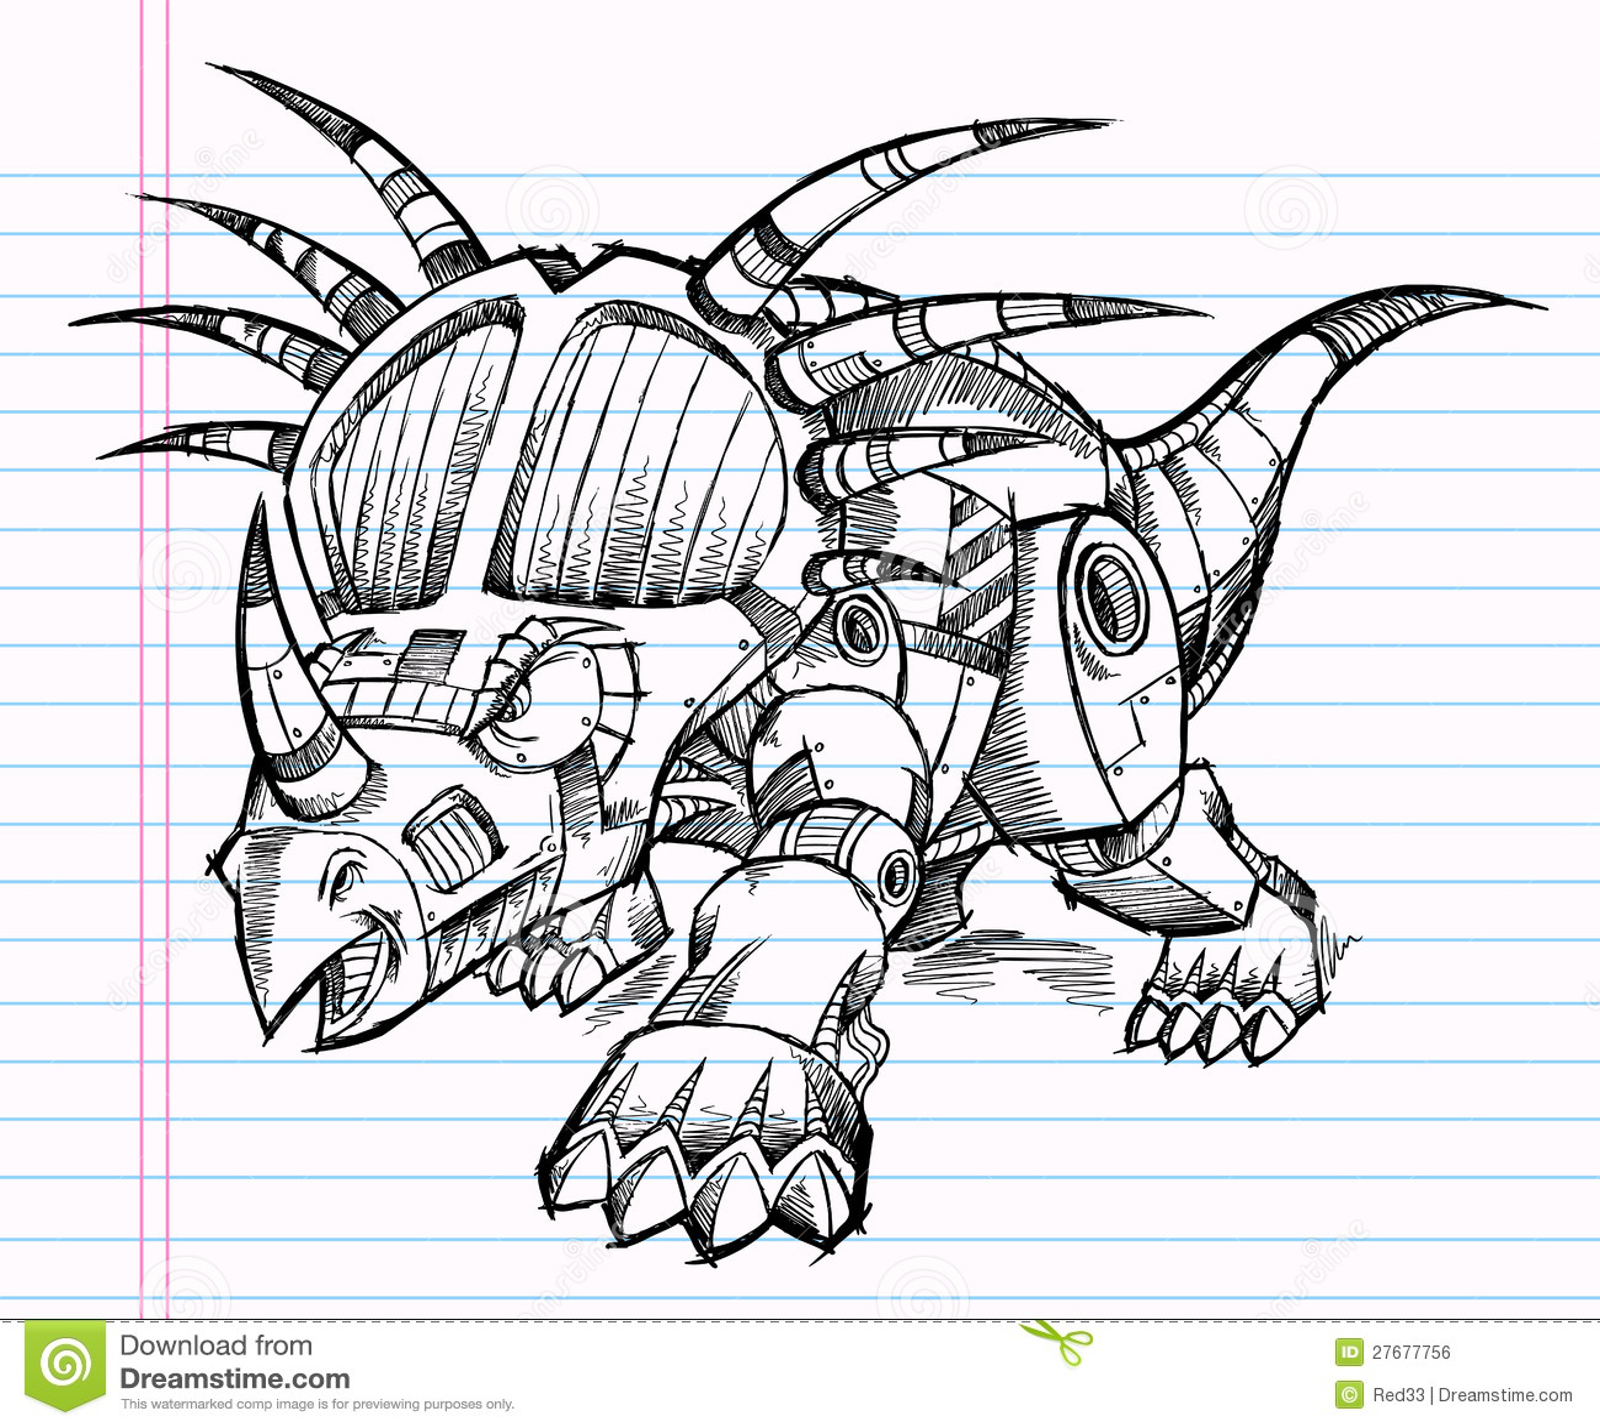 Robot Triceratops Dinosaur Sketch Royalty Free Stock Image